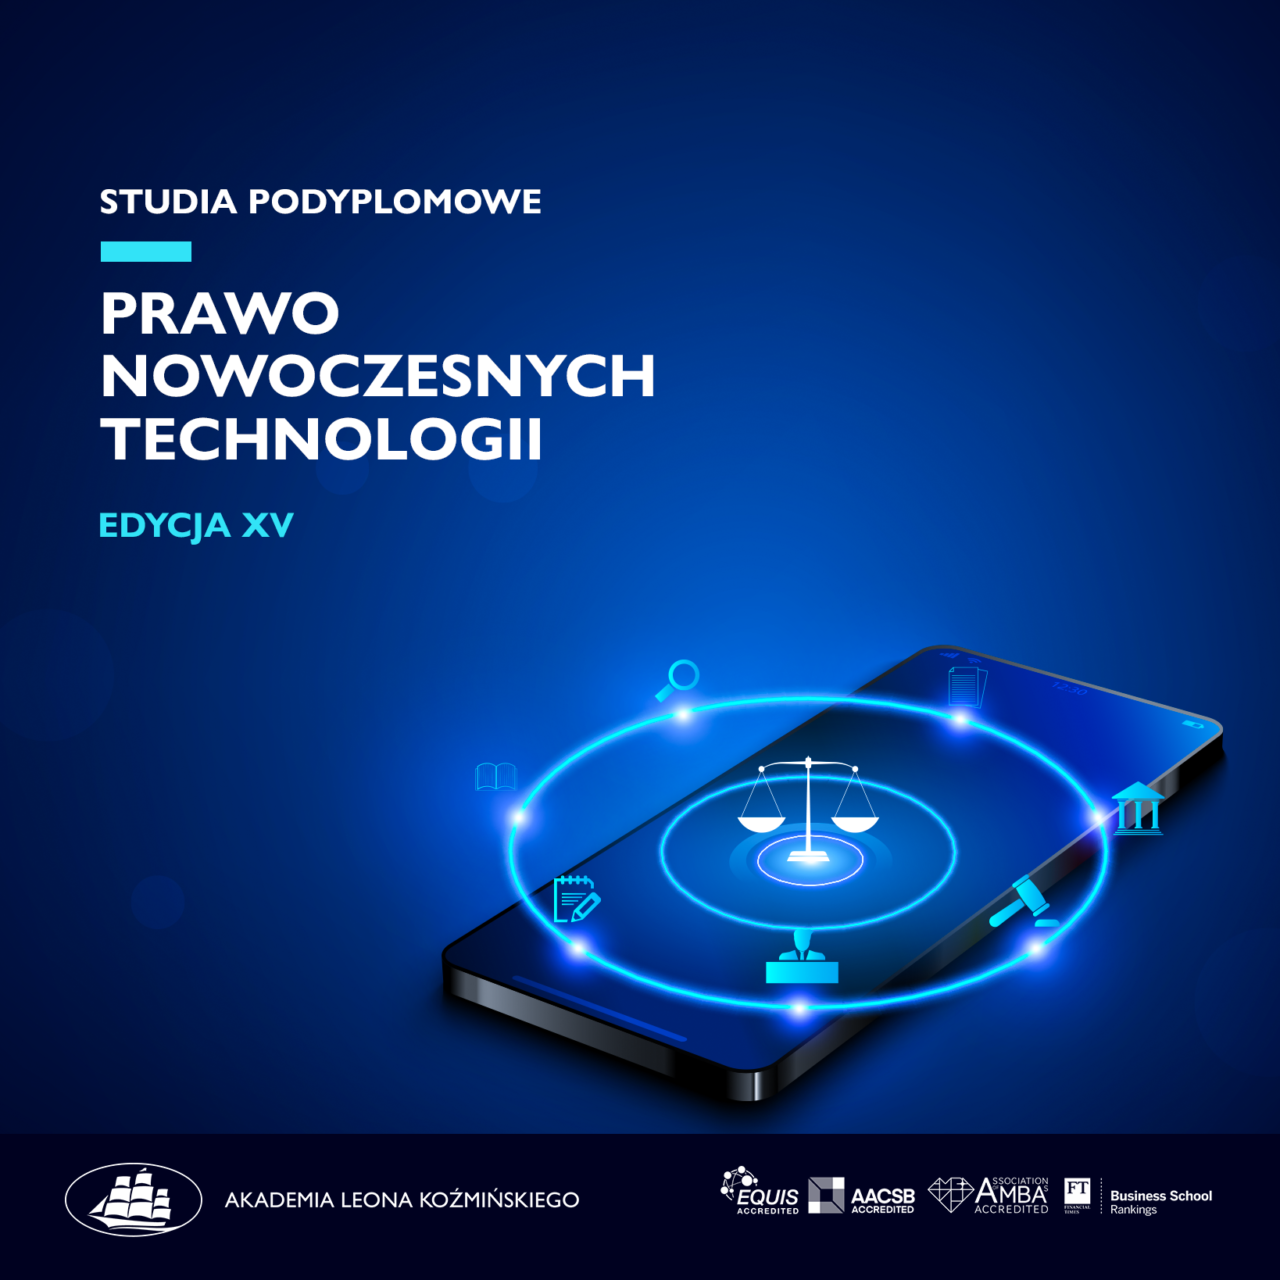 http://ailawtech.org/wp-content/uploads/2021/07/prawo-nowoczesnych-mediow-promo-1280x1280.png